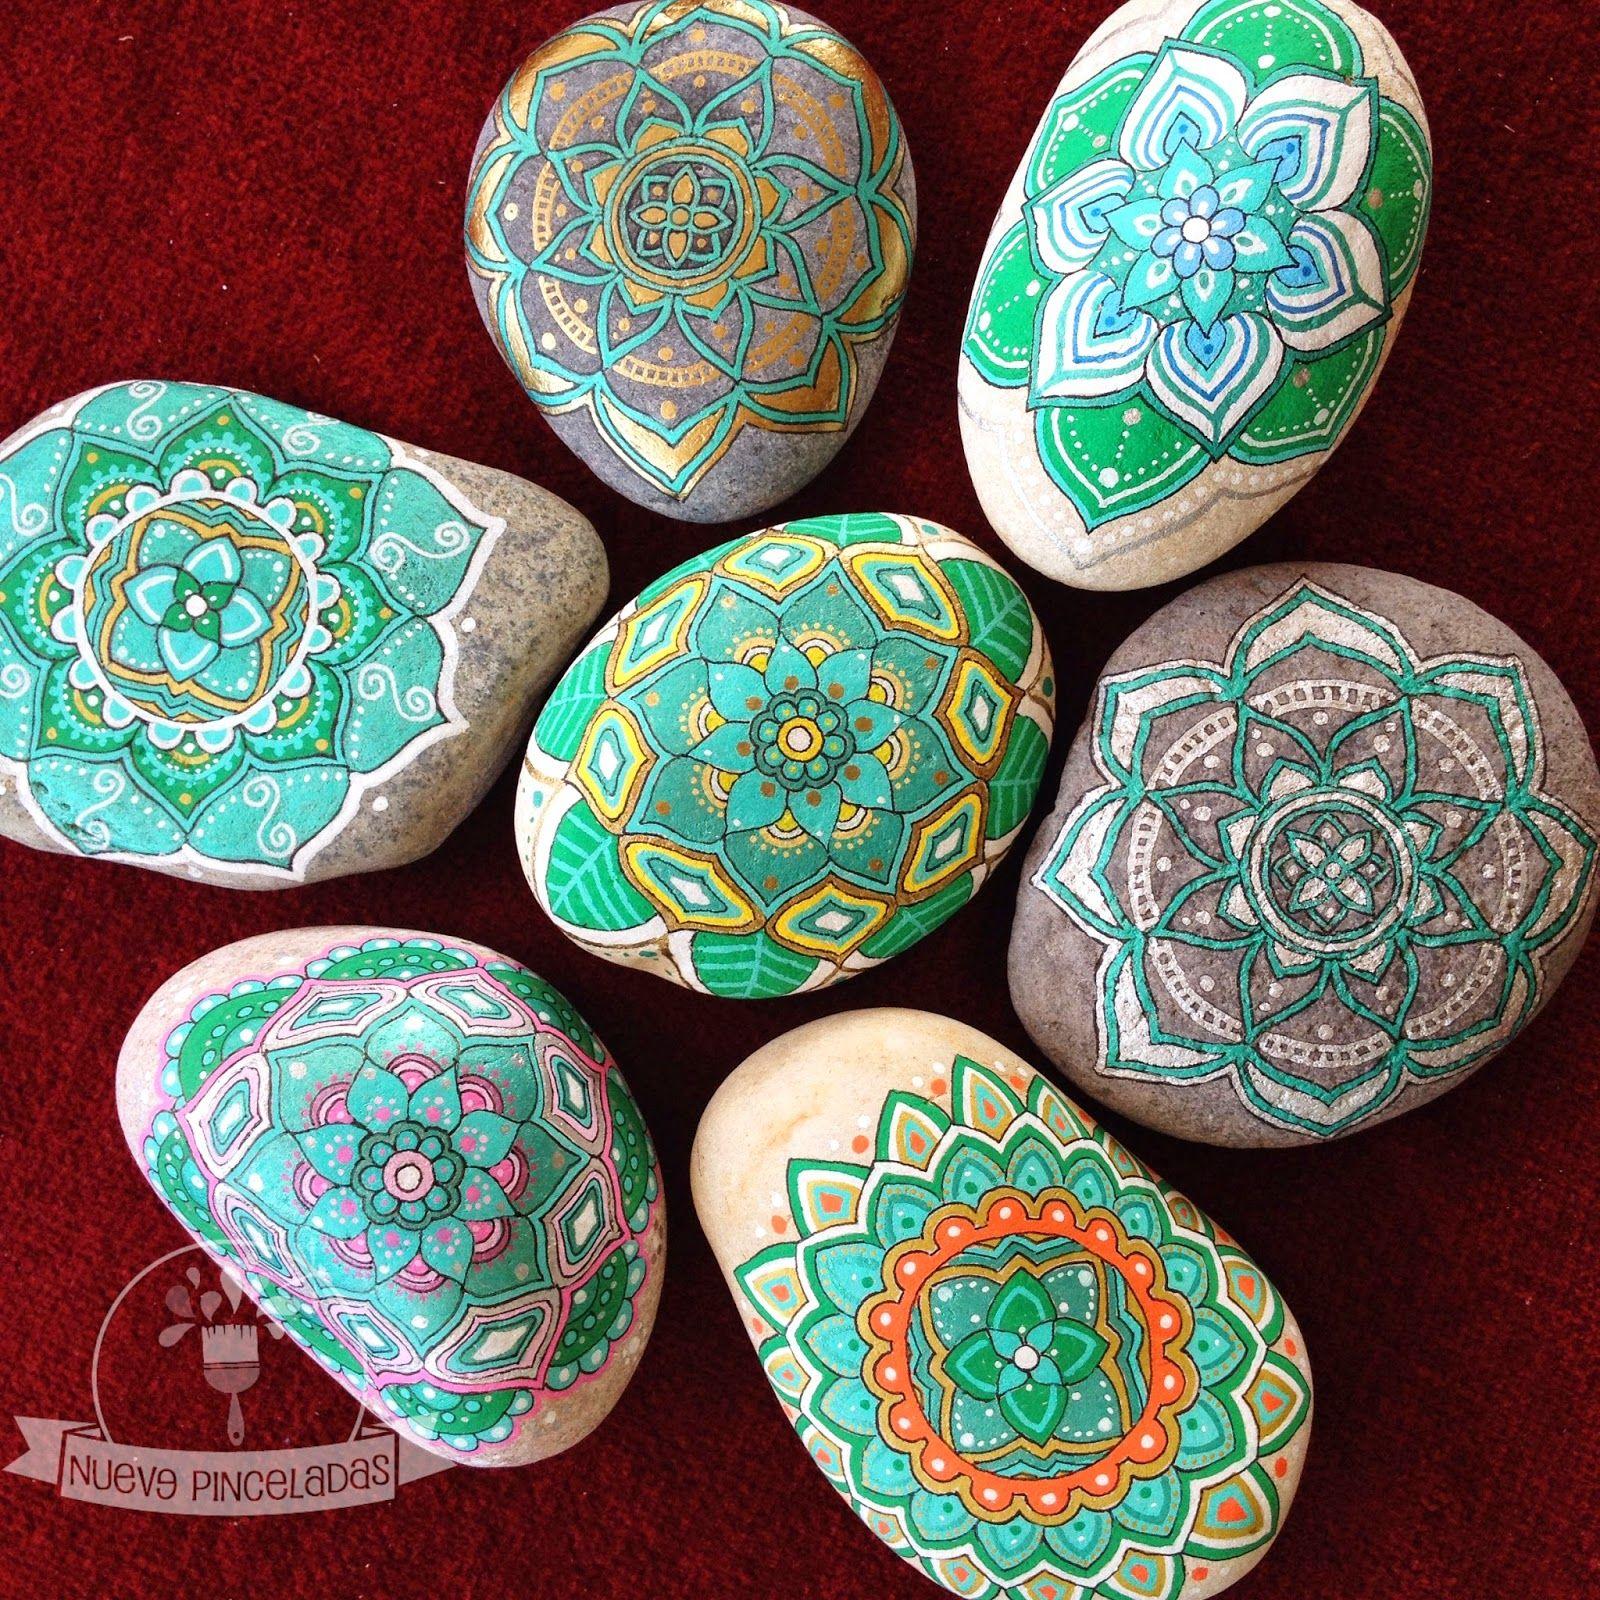 Nueve Pinceladas Piedras Y Mandalas O Mandalas Y Piedras Rocas Pintadas Con Mandalas Piedras Piedras Pintadas A Mano